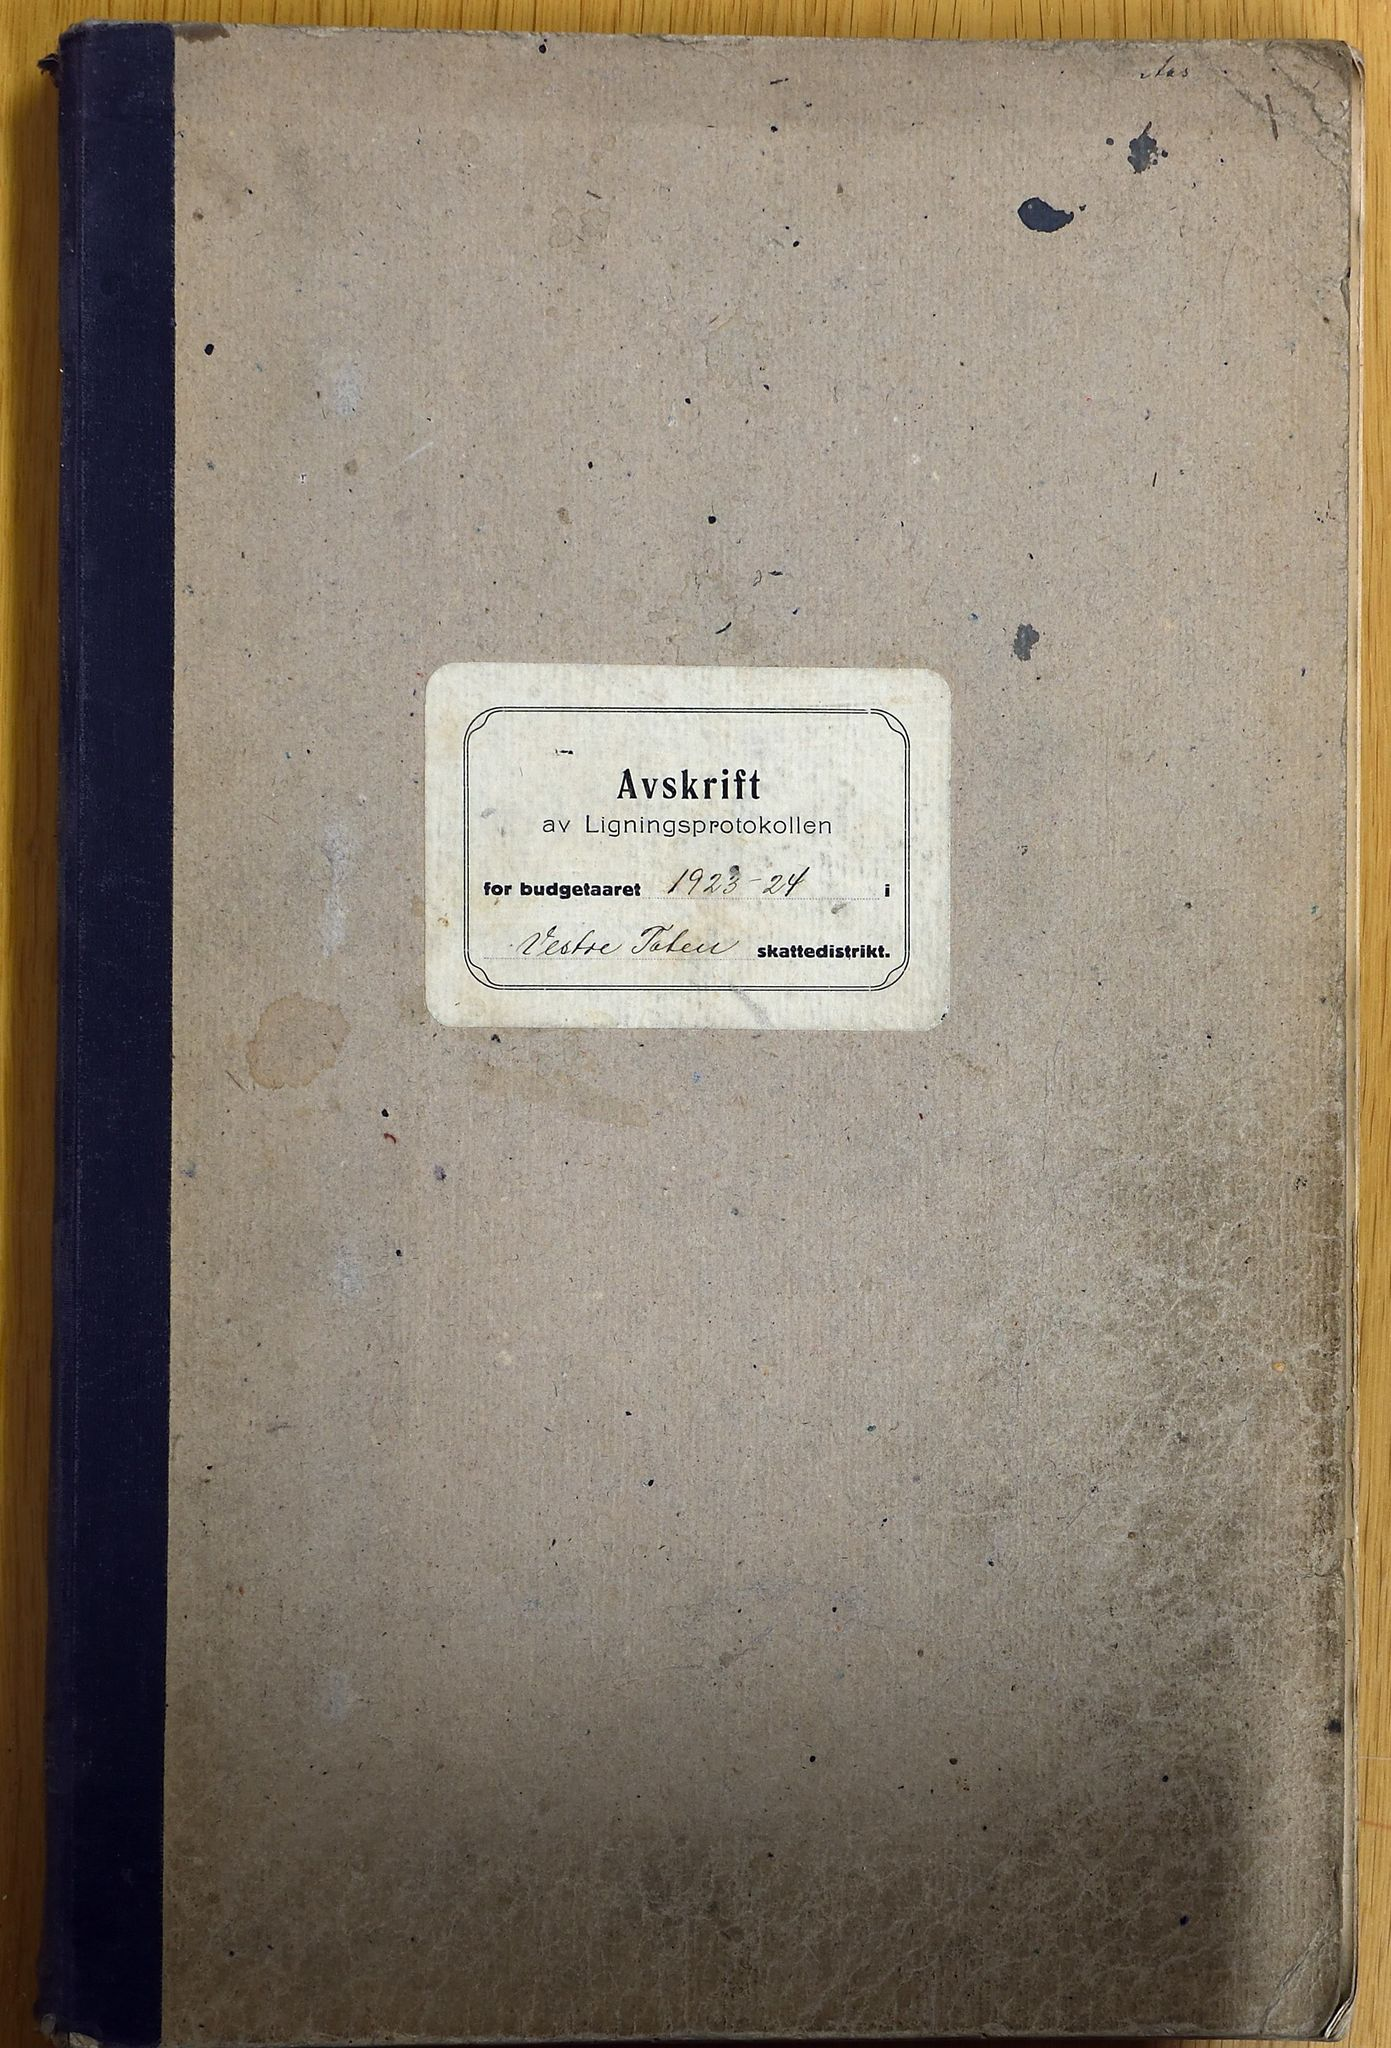 KVT, Vestre Toten municipality archive – Vestre Toten, Tax assessment protocol 1923-1924, 1923-1924